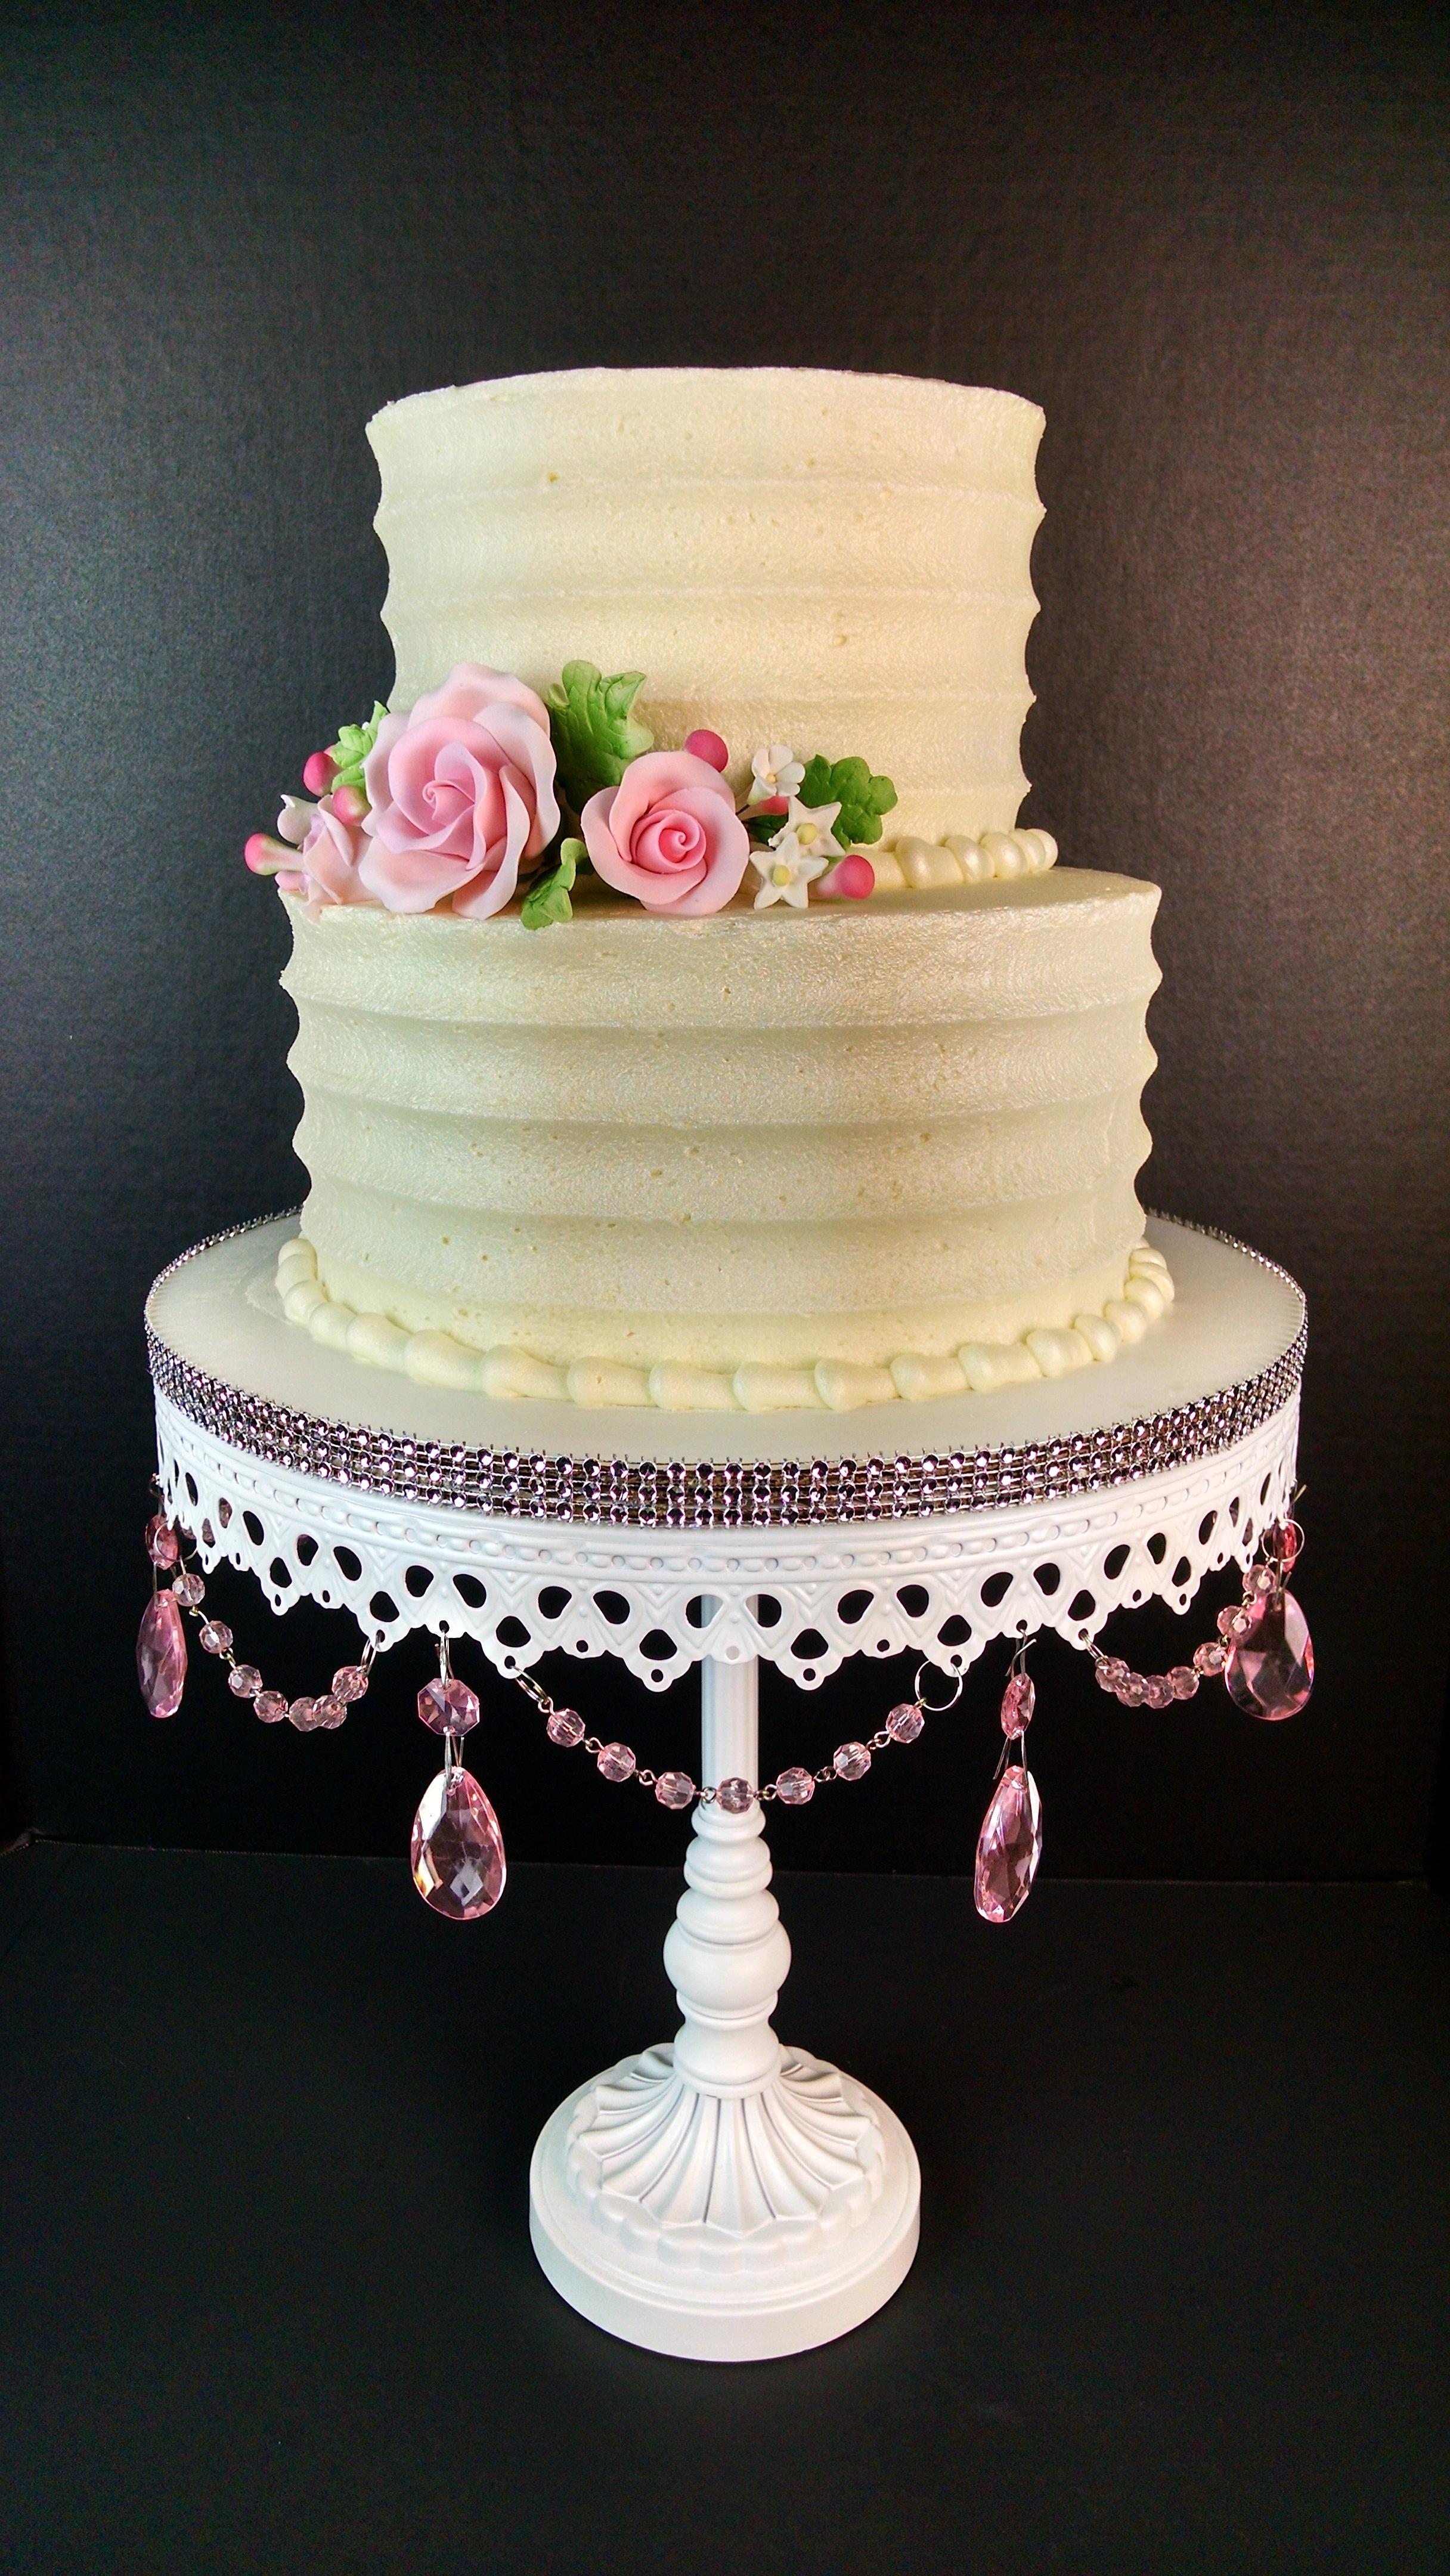 Maria & Todd's Wedding Cake